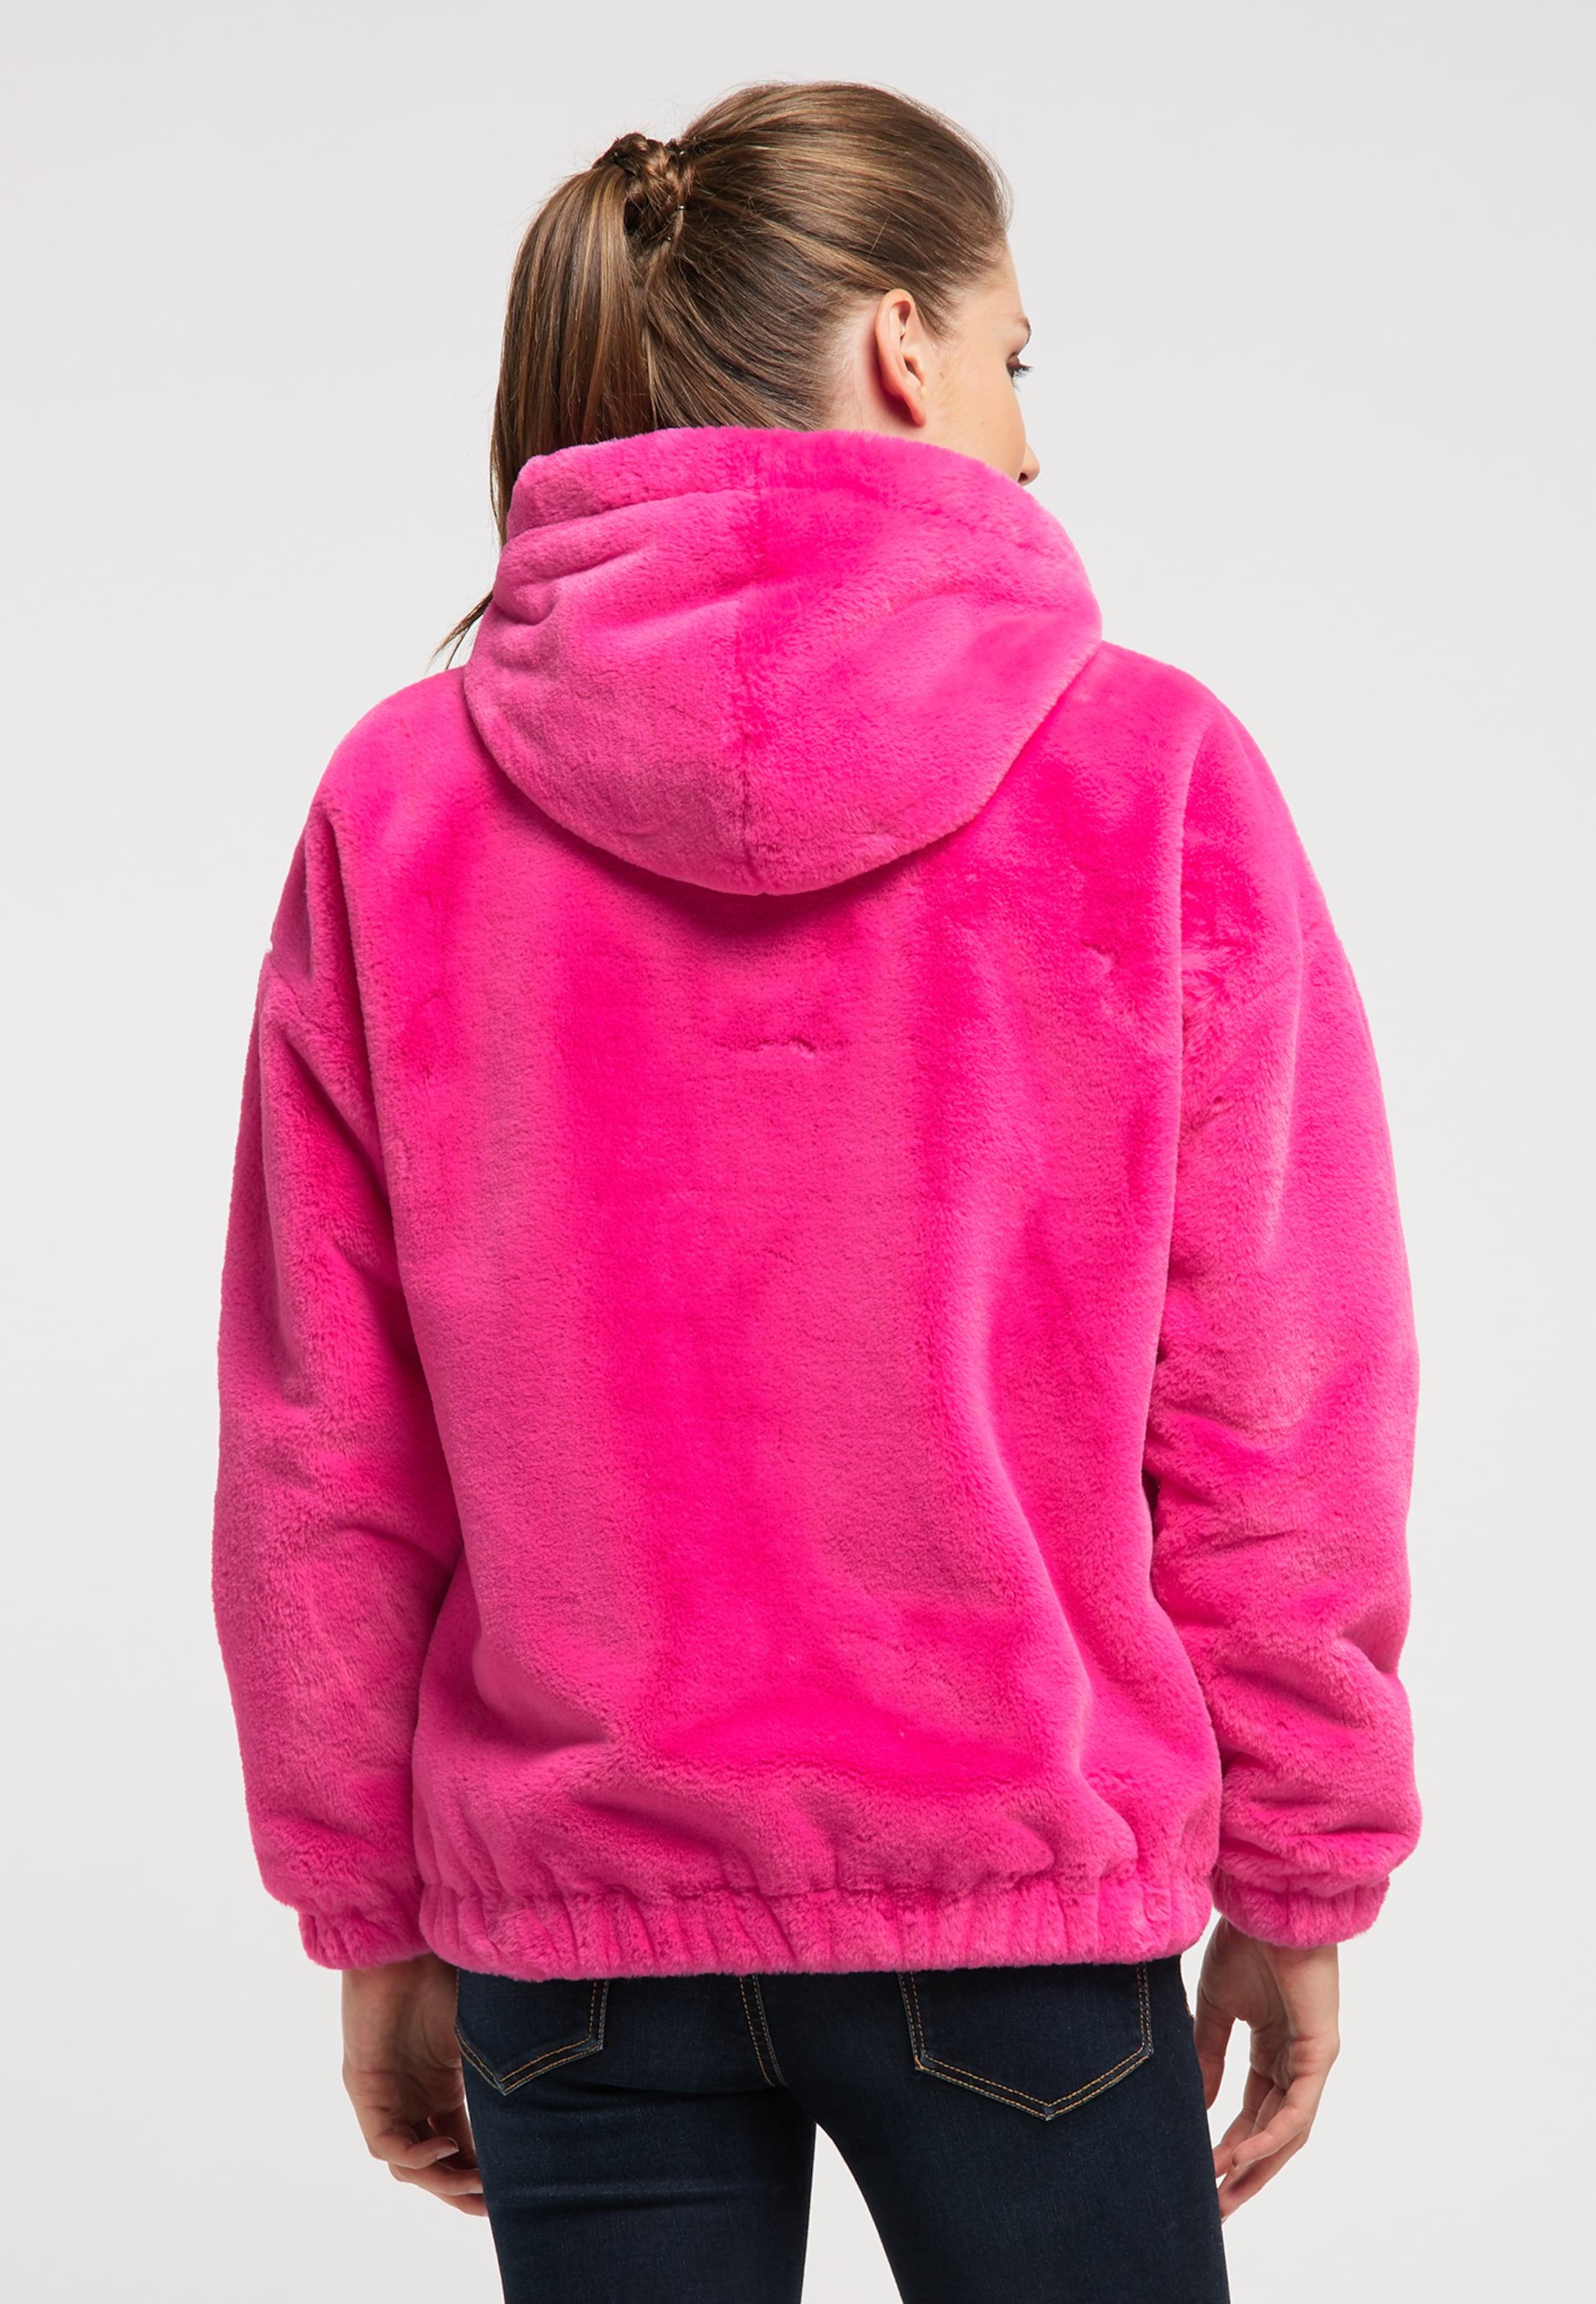 Pink Mymo Mymo Jacke Pink Mymo Jacke In Pink Jacke Jacke Mymo In In OkuPZXiT